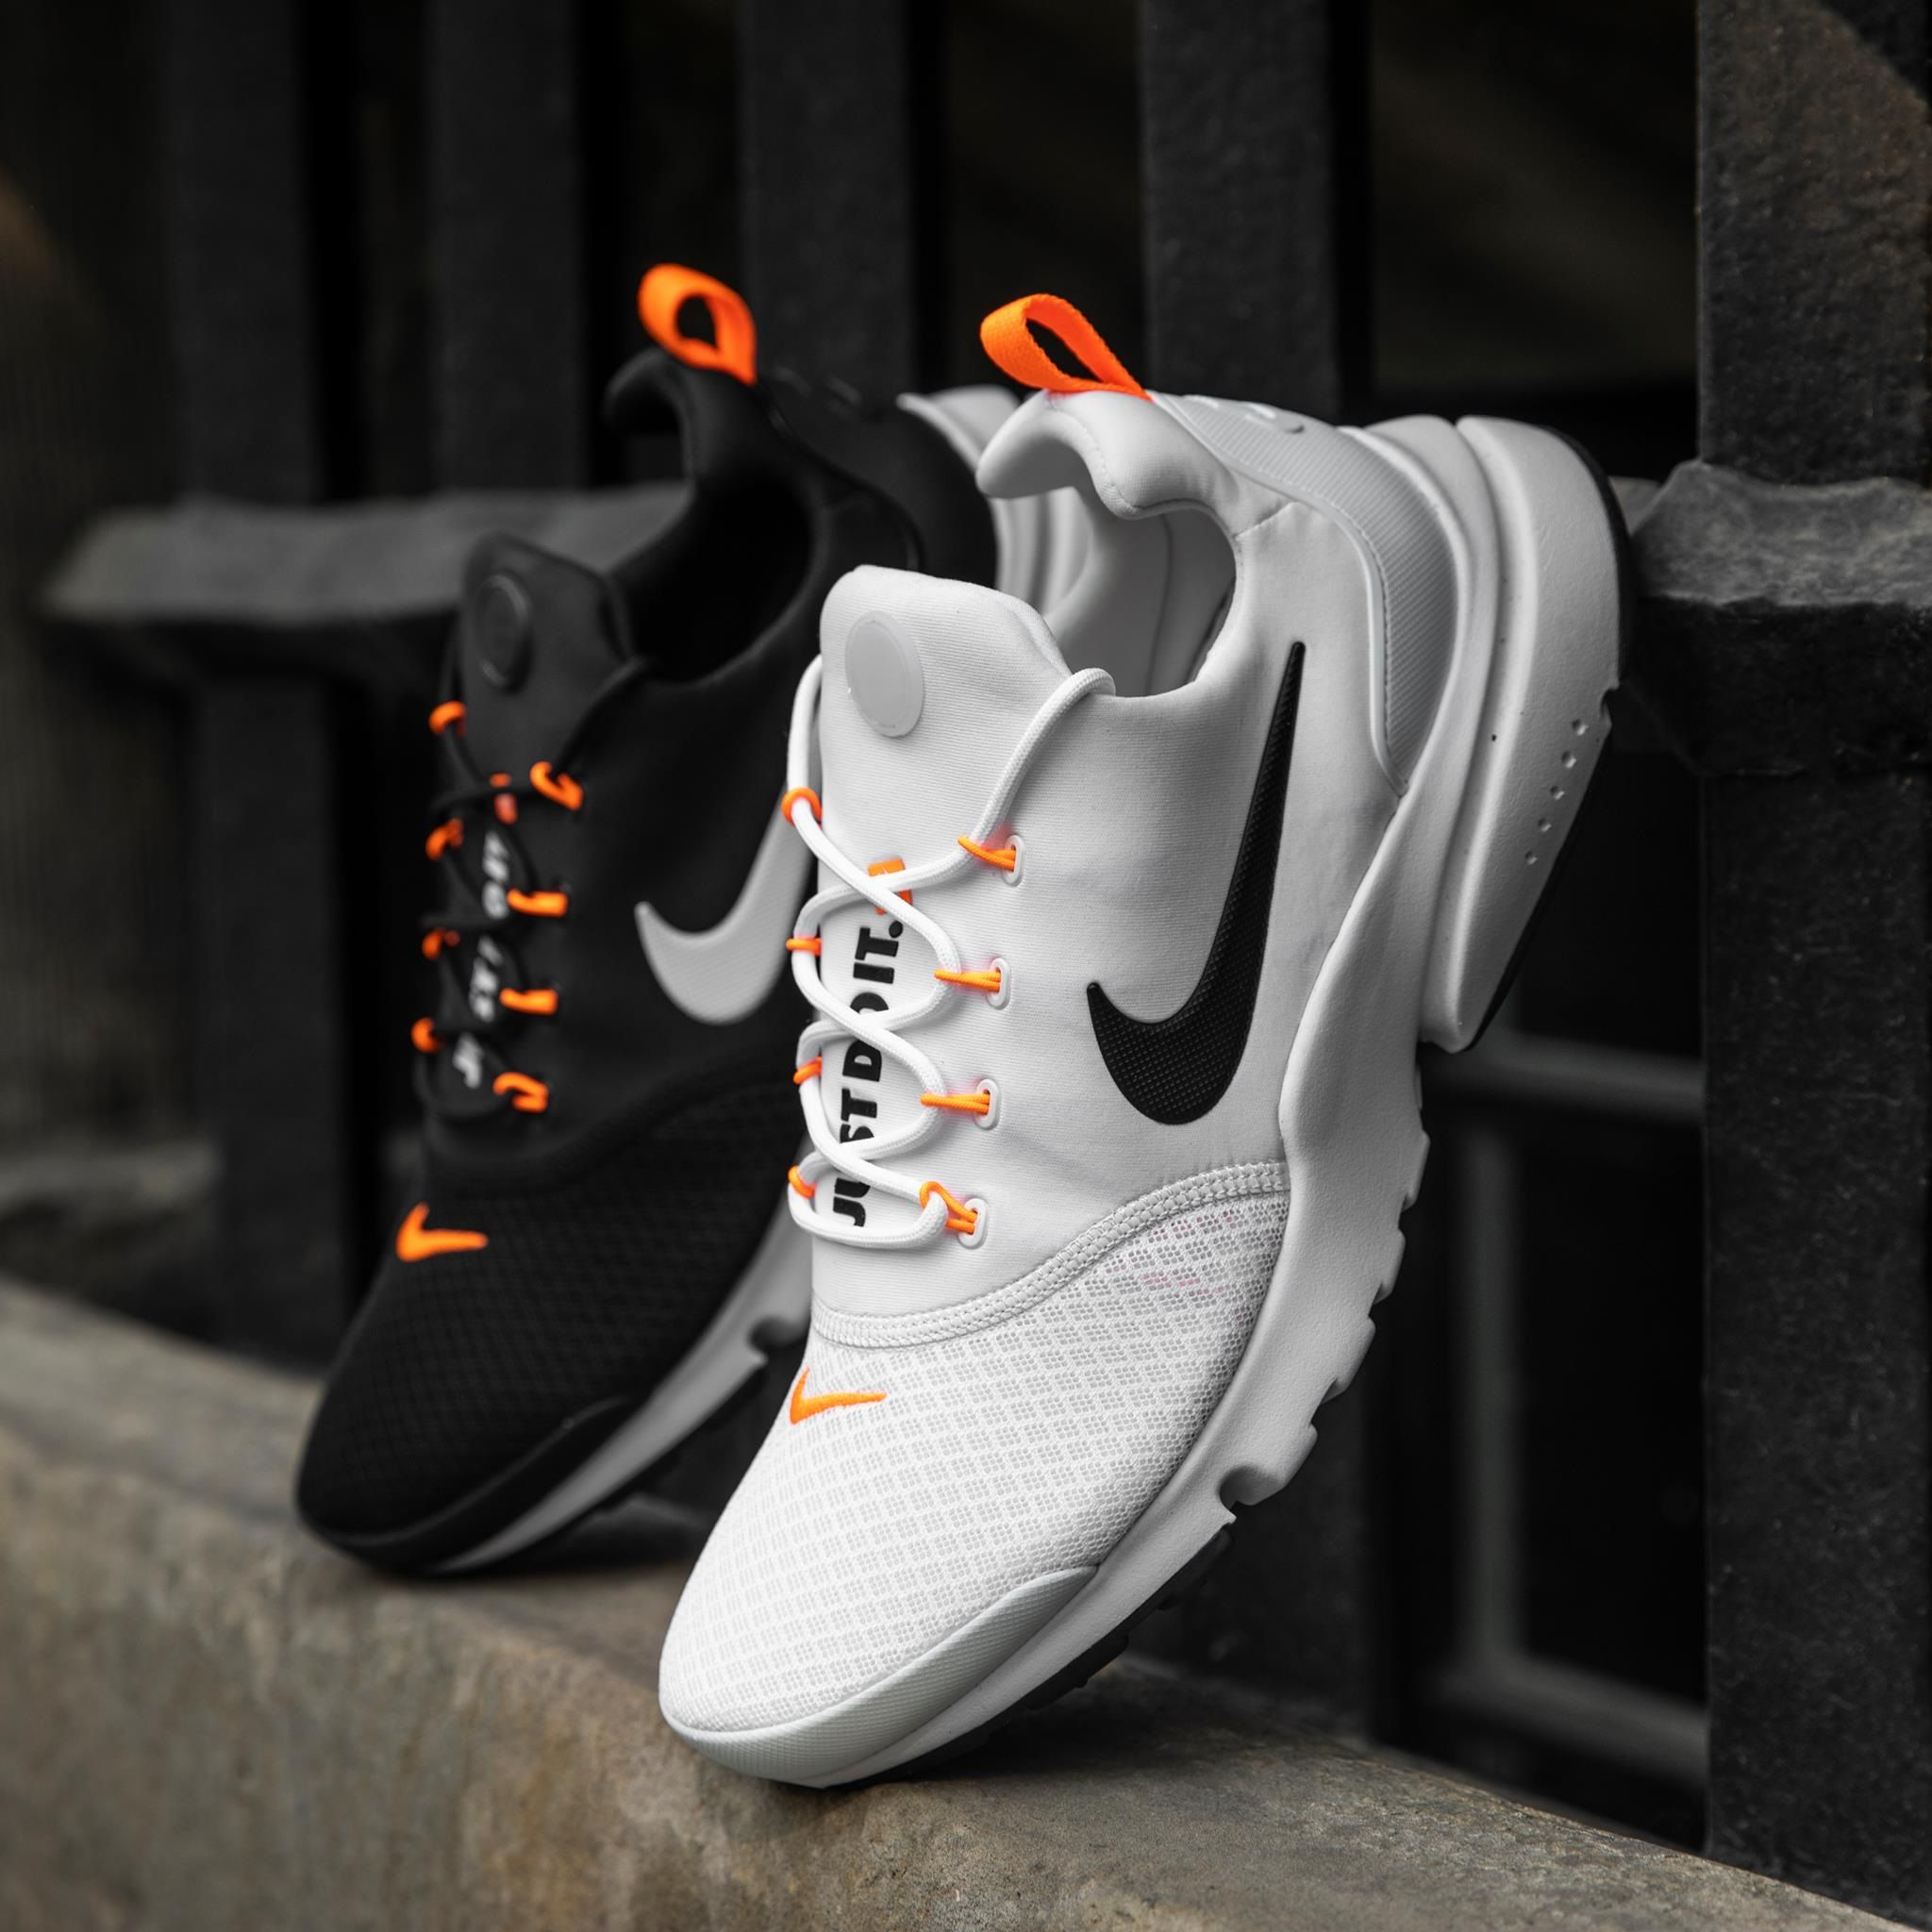 Pez anémona Objetado Incienso  Nike Air Presto Fly | Nike presto, Shoe boots, Nike